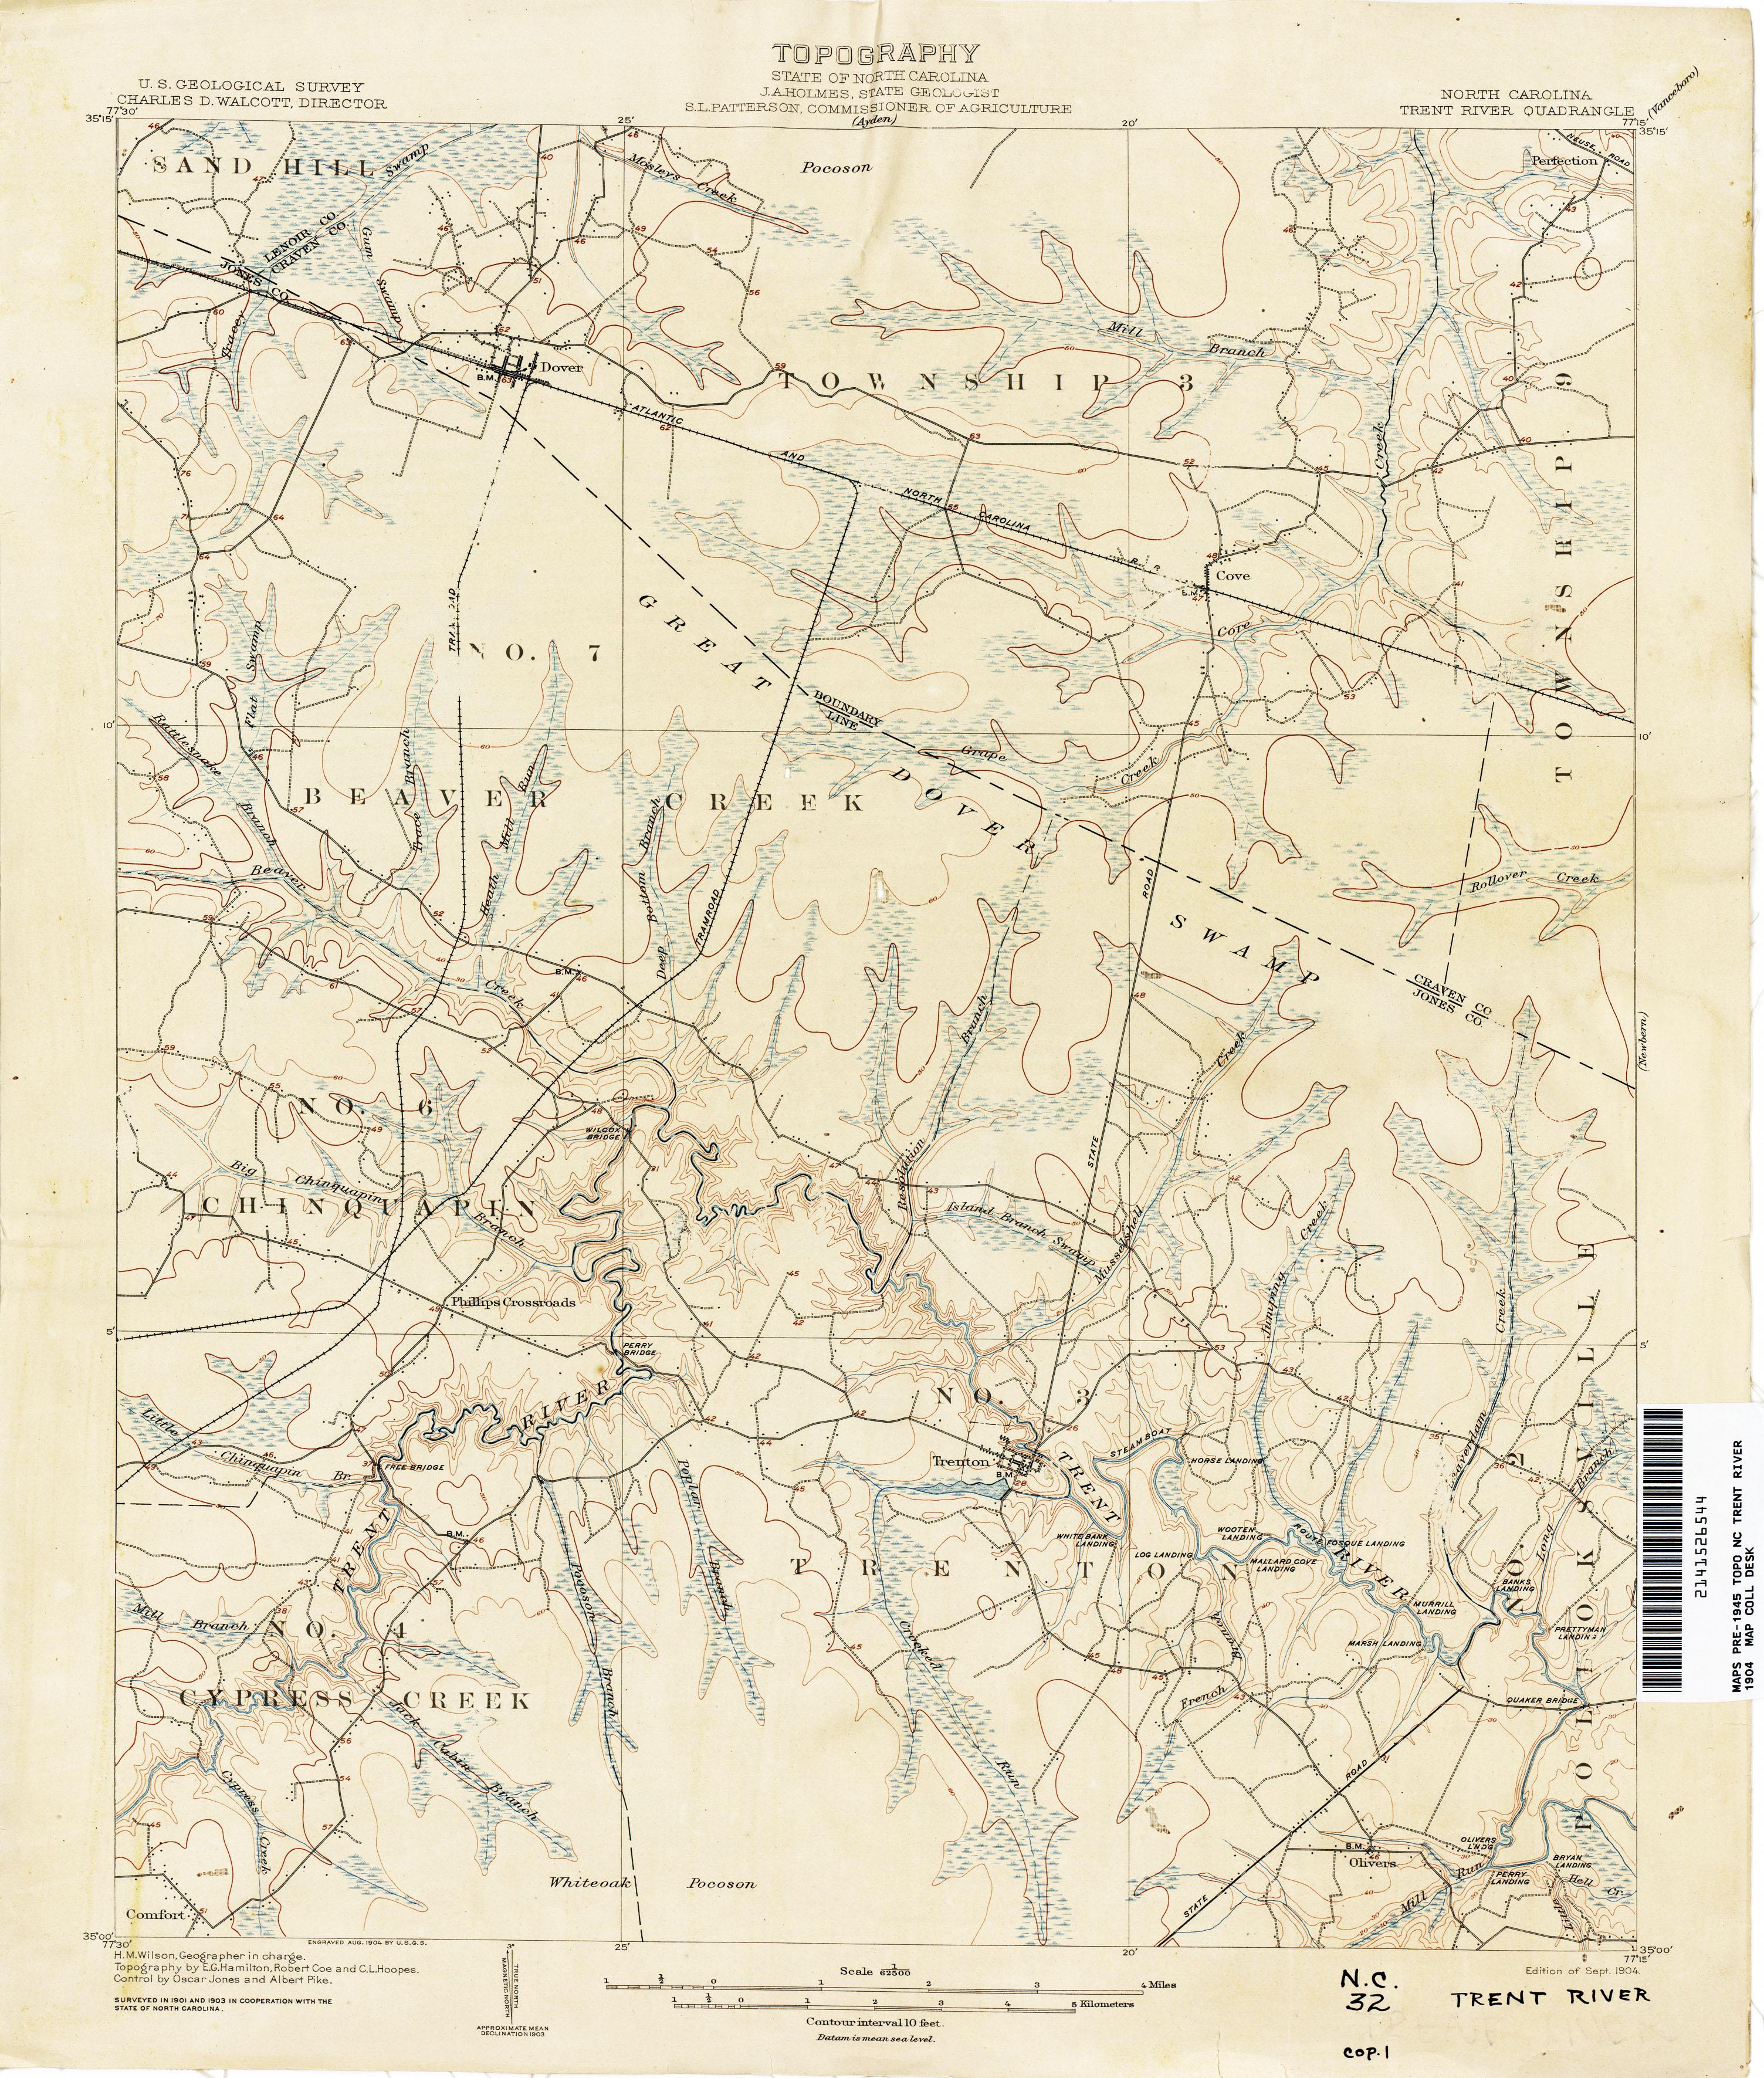 Hamilton Nc Map.North Carolina Historical Topographic Maps Perry Castaneda Map